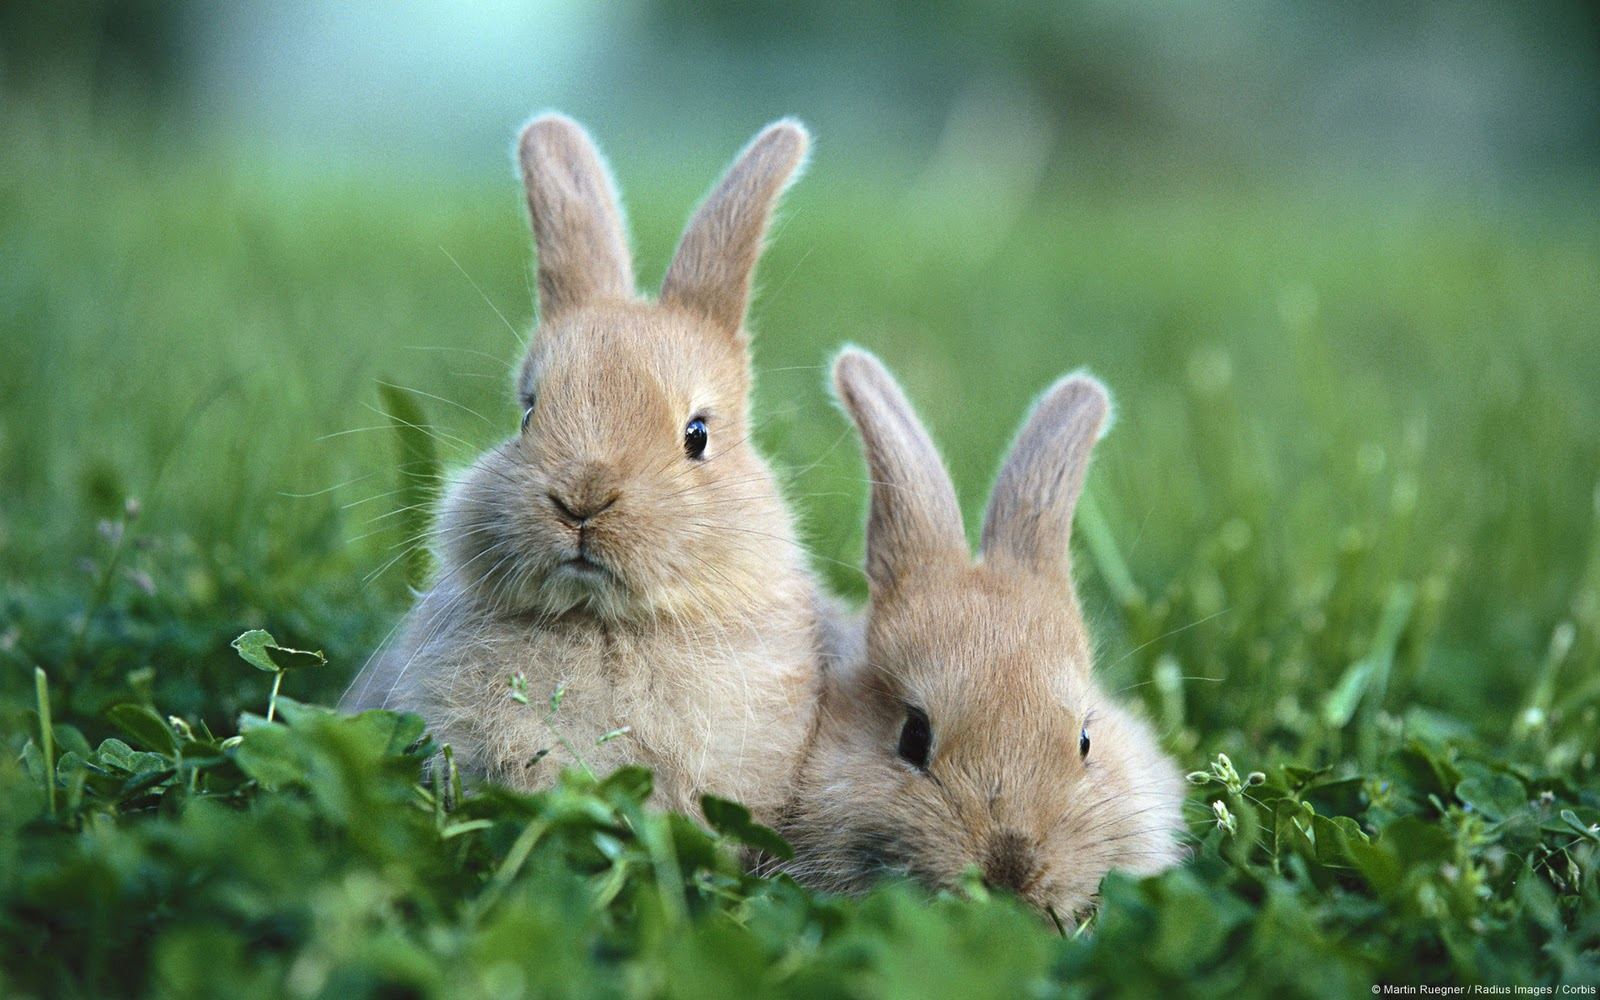 Cute Rabbits Cute Rabbits In Photos...